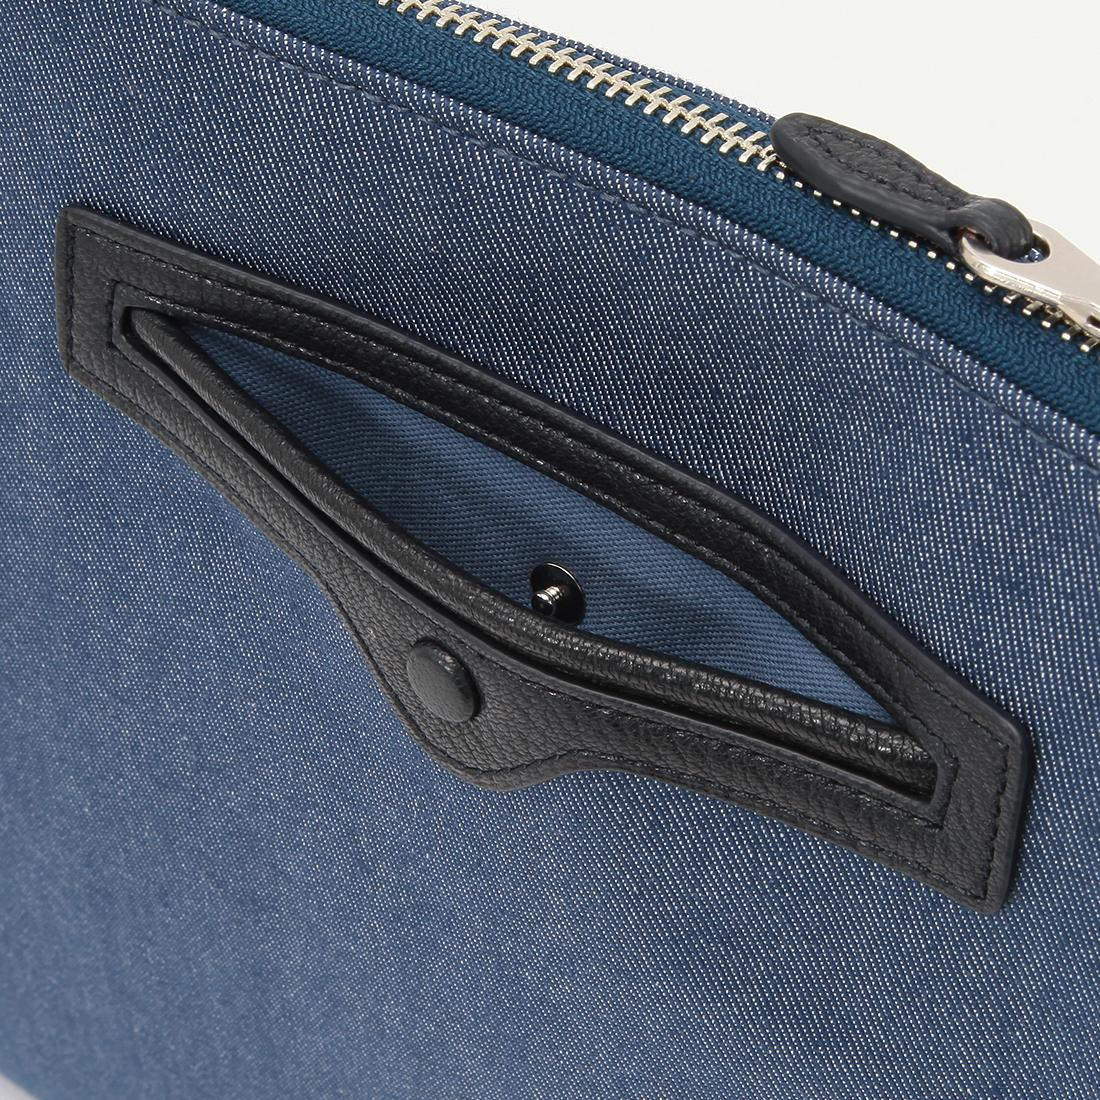 Galleriant Clutch Bag 2018965: Blue